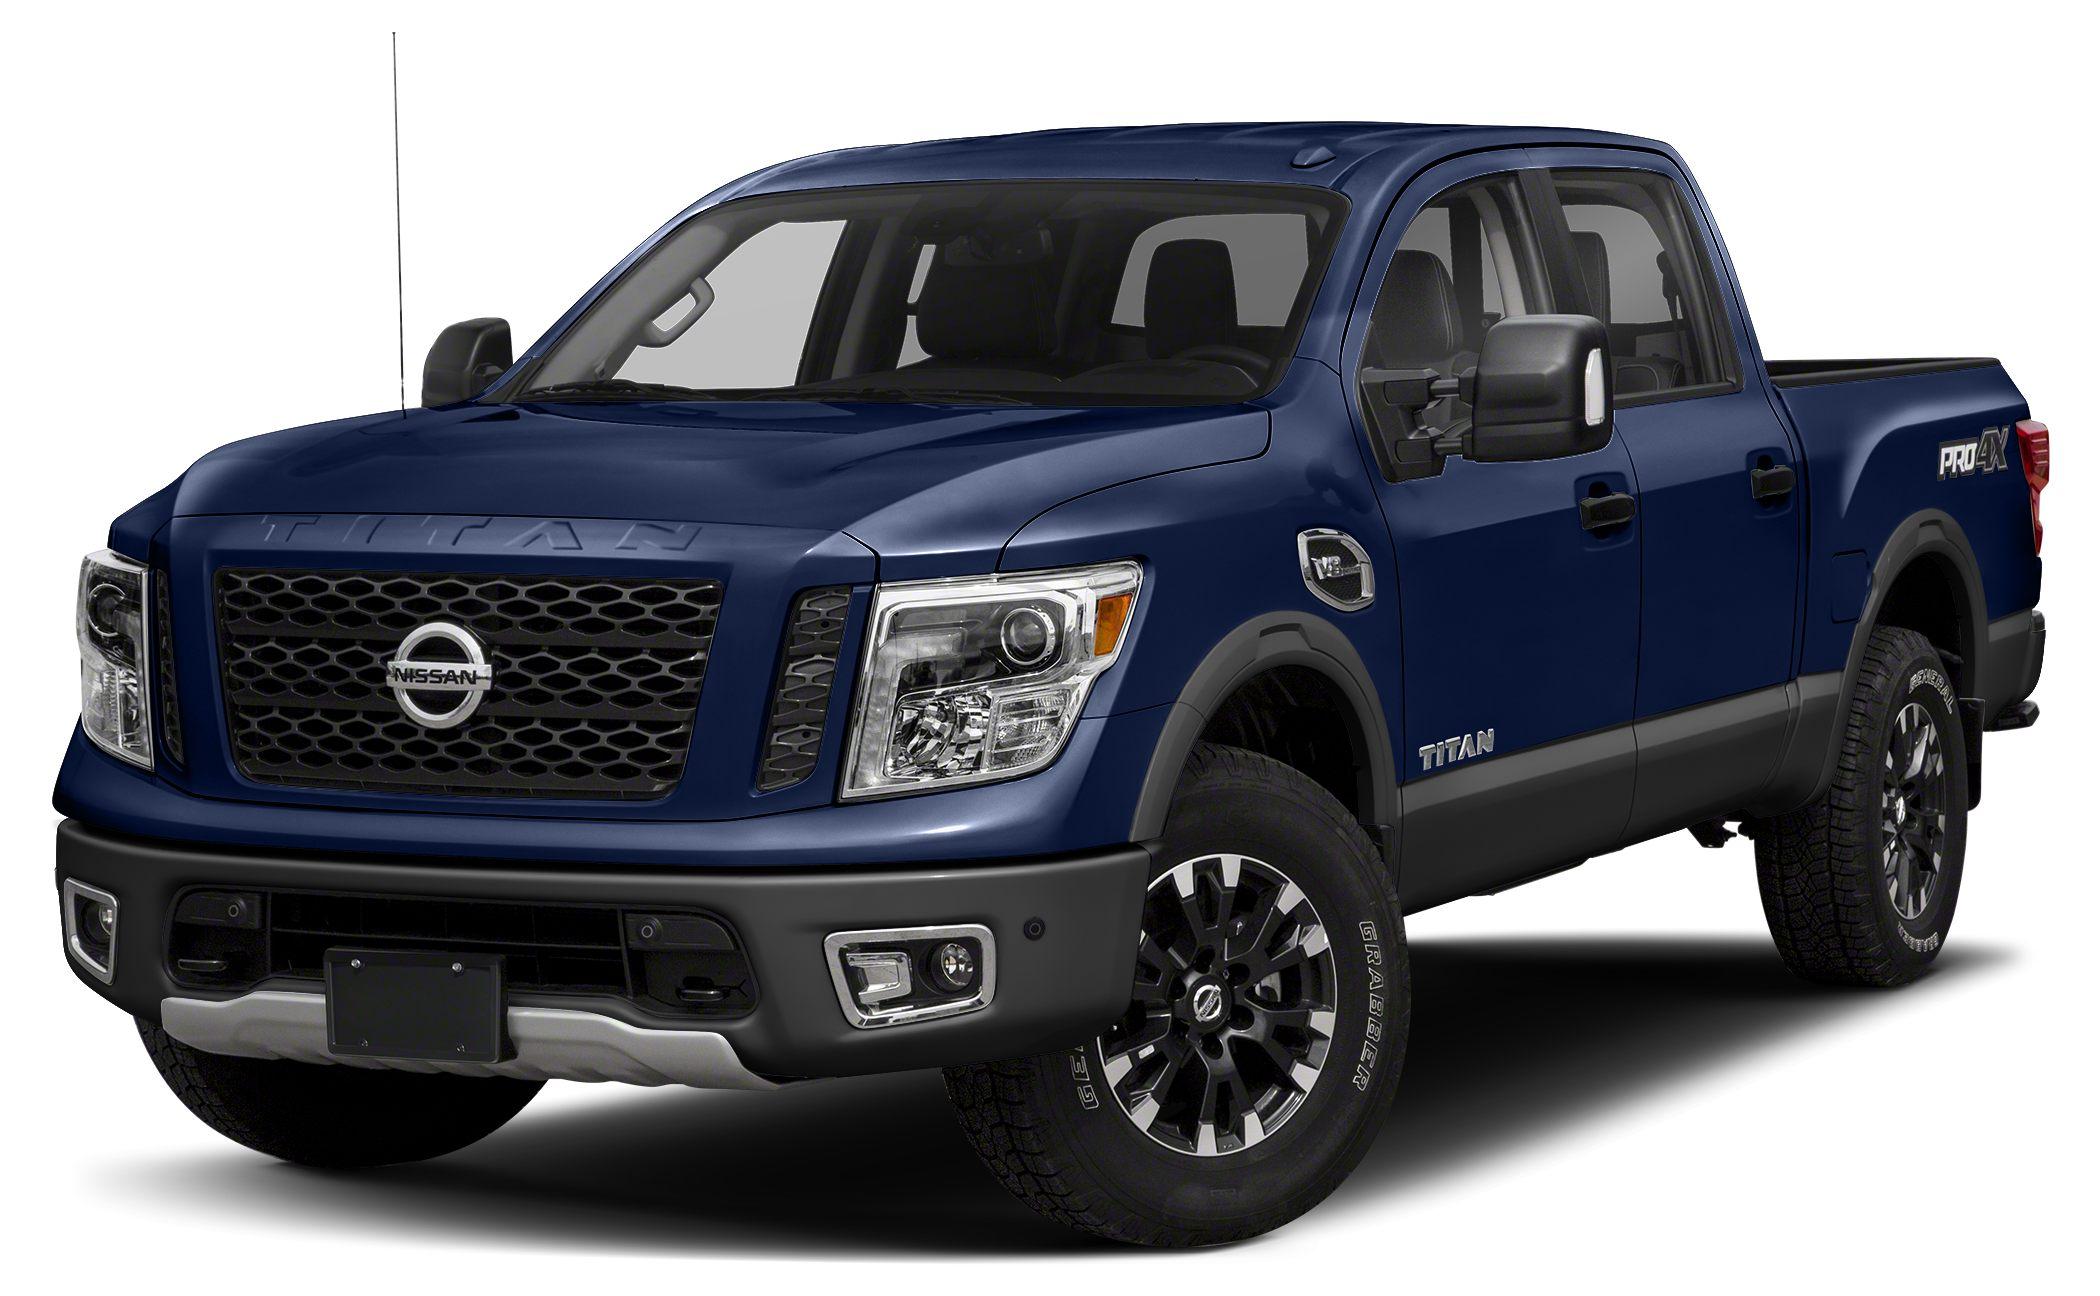 2017 Nissan Titan PRO-4X Miles 9Color Deep Blue Pearl Stock 17T264 VIN 1N6AA1E52HN549318